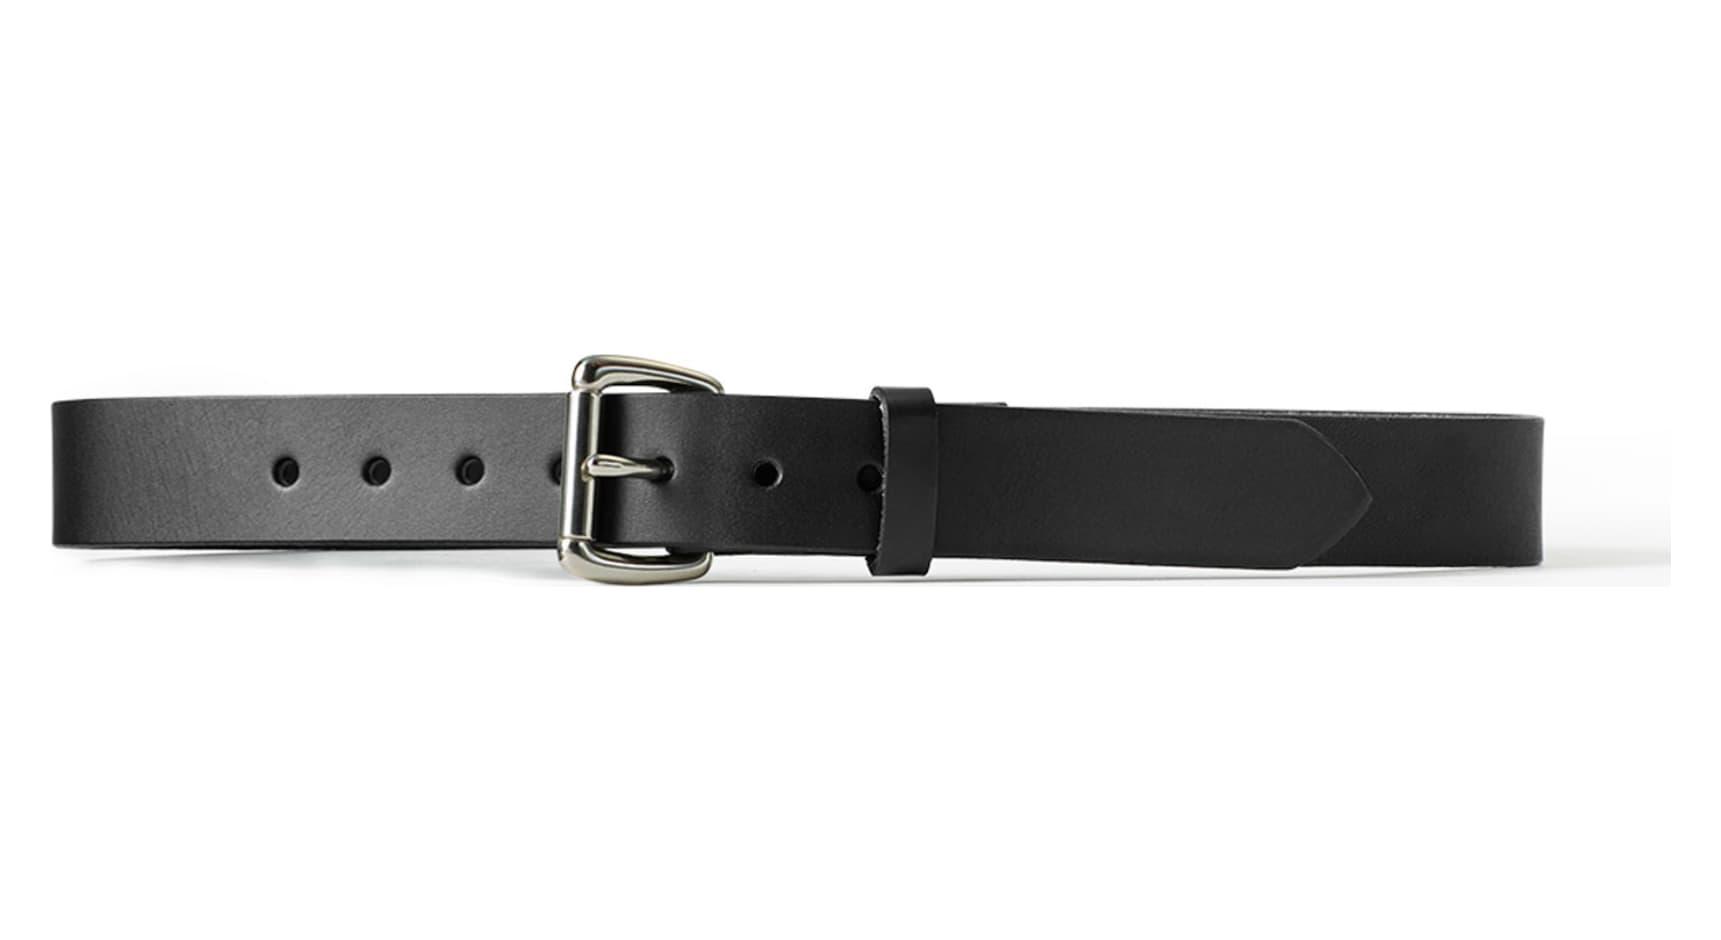 filson 63203 1 1 4 inch leather belt black 40